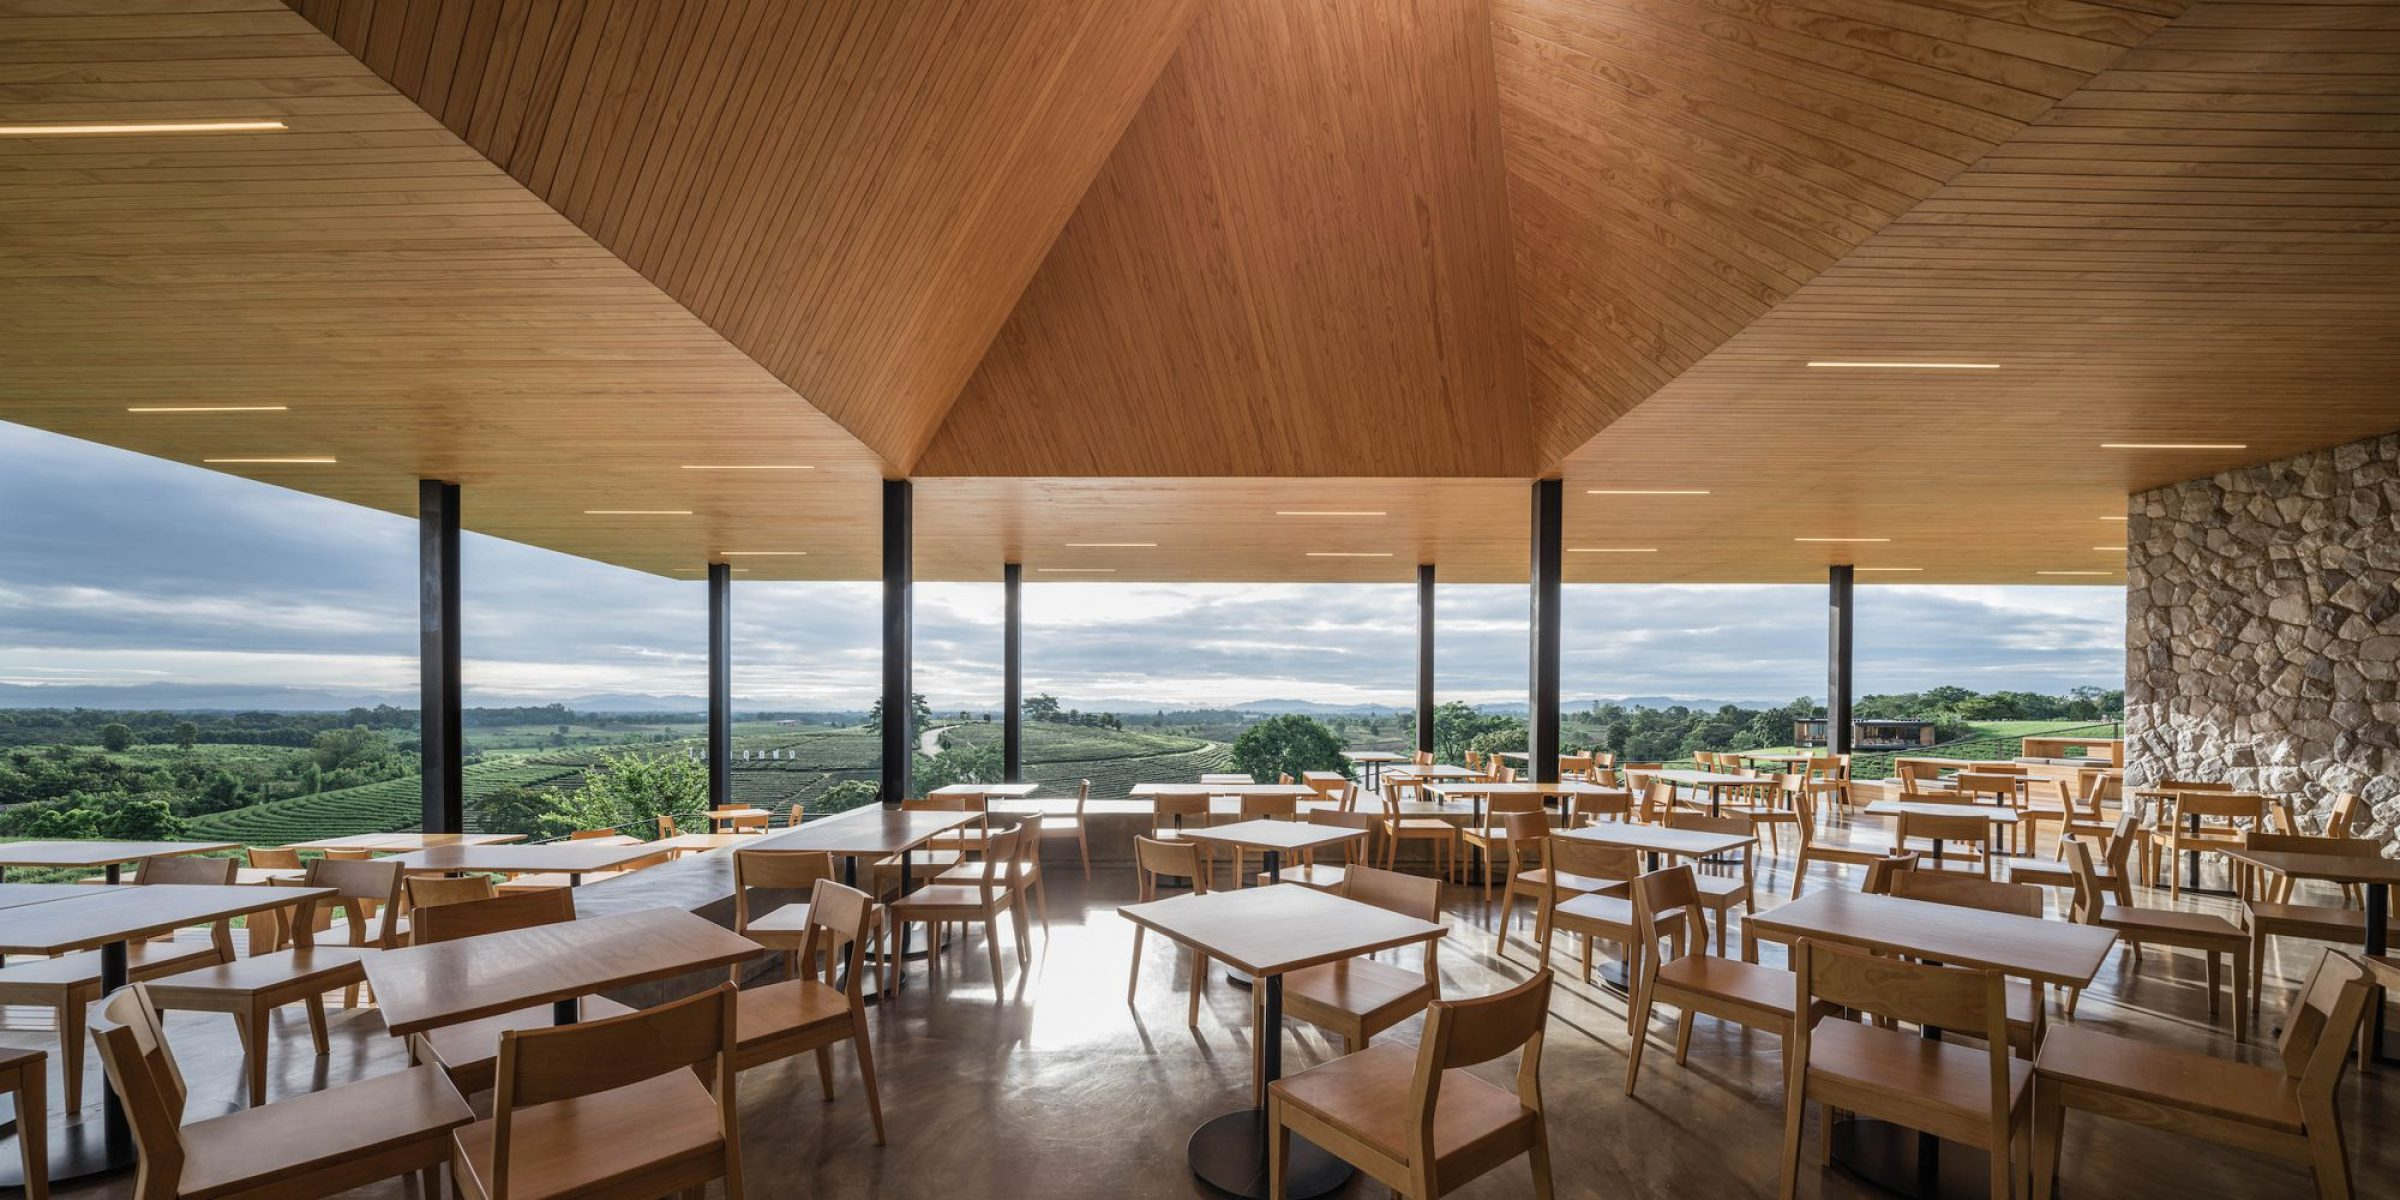 Choui Fong Tea Cafe Idin Architects Arch2o Com